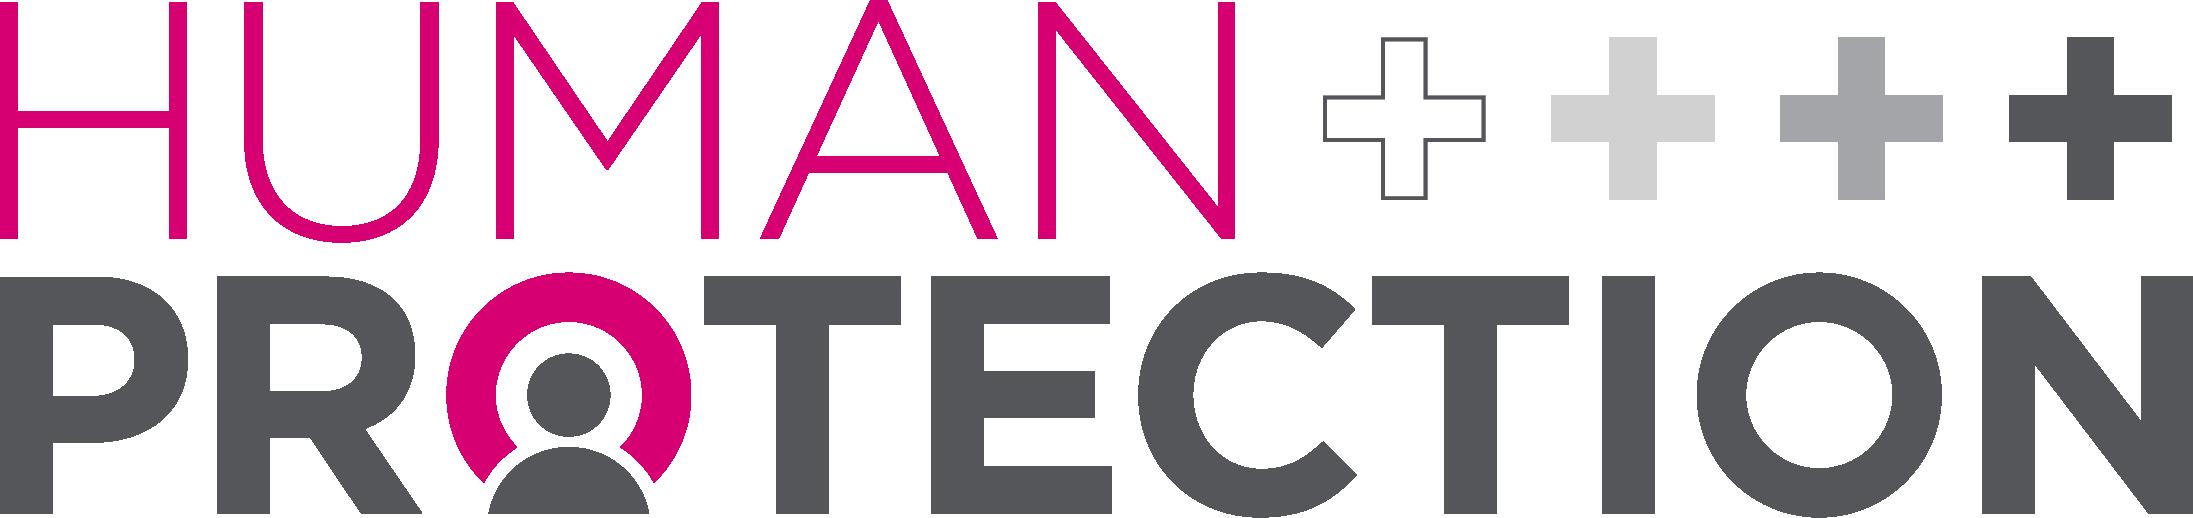 humanprotection_merk_logo_2019.png